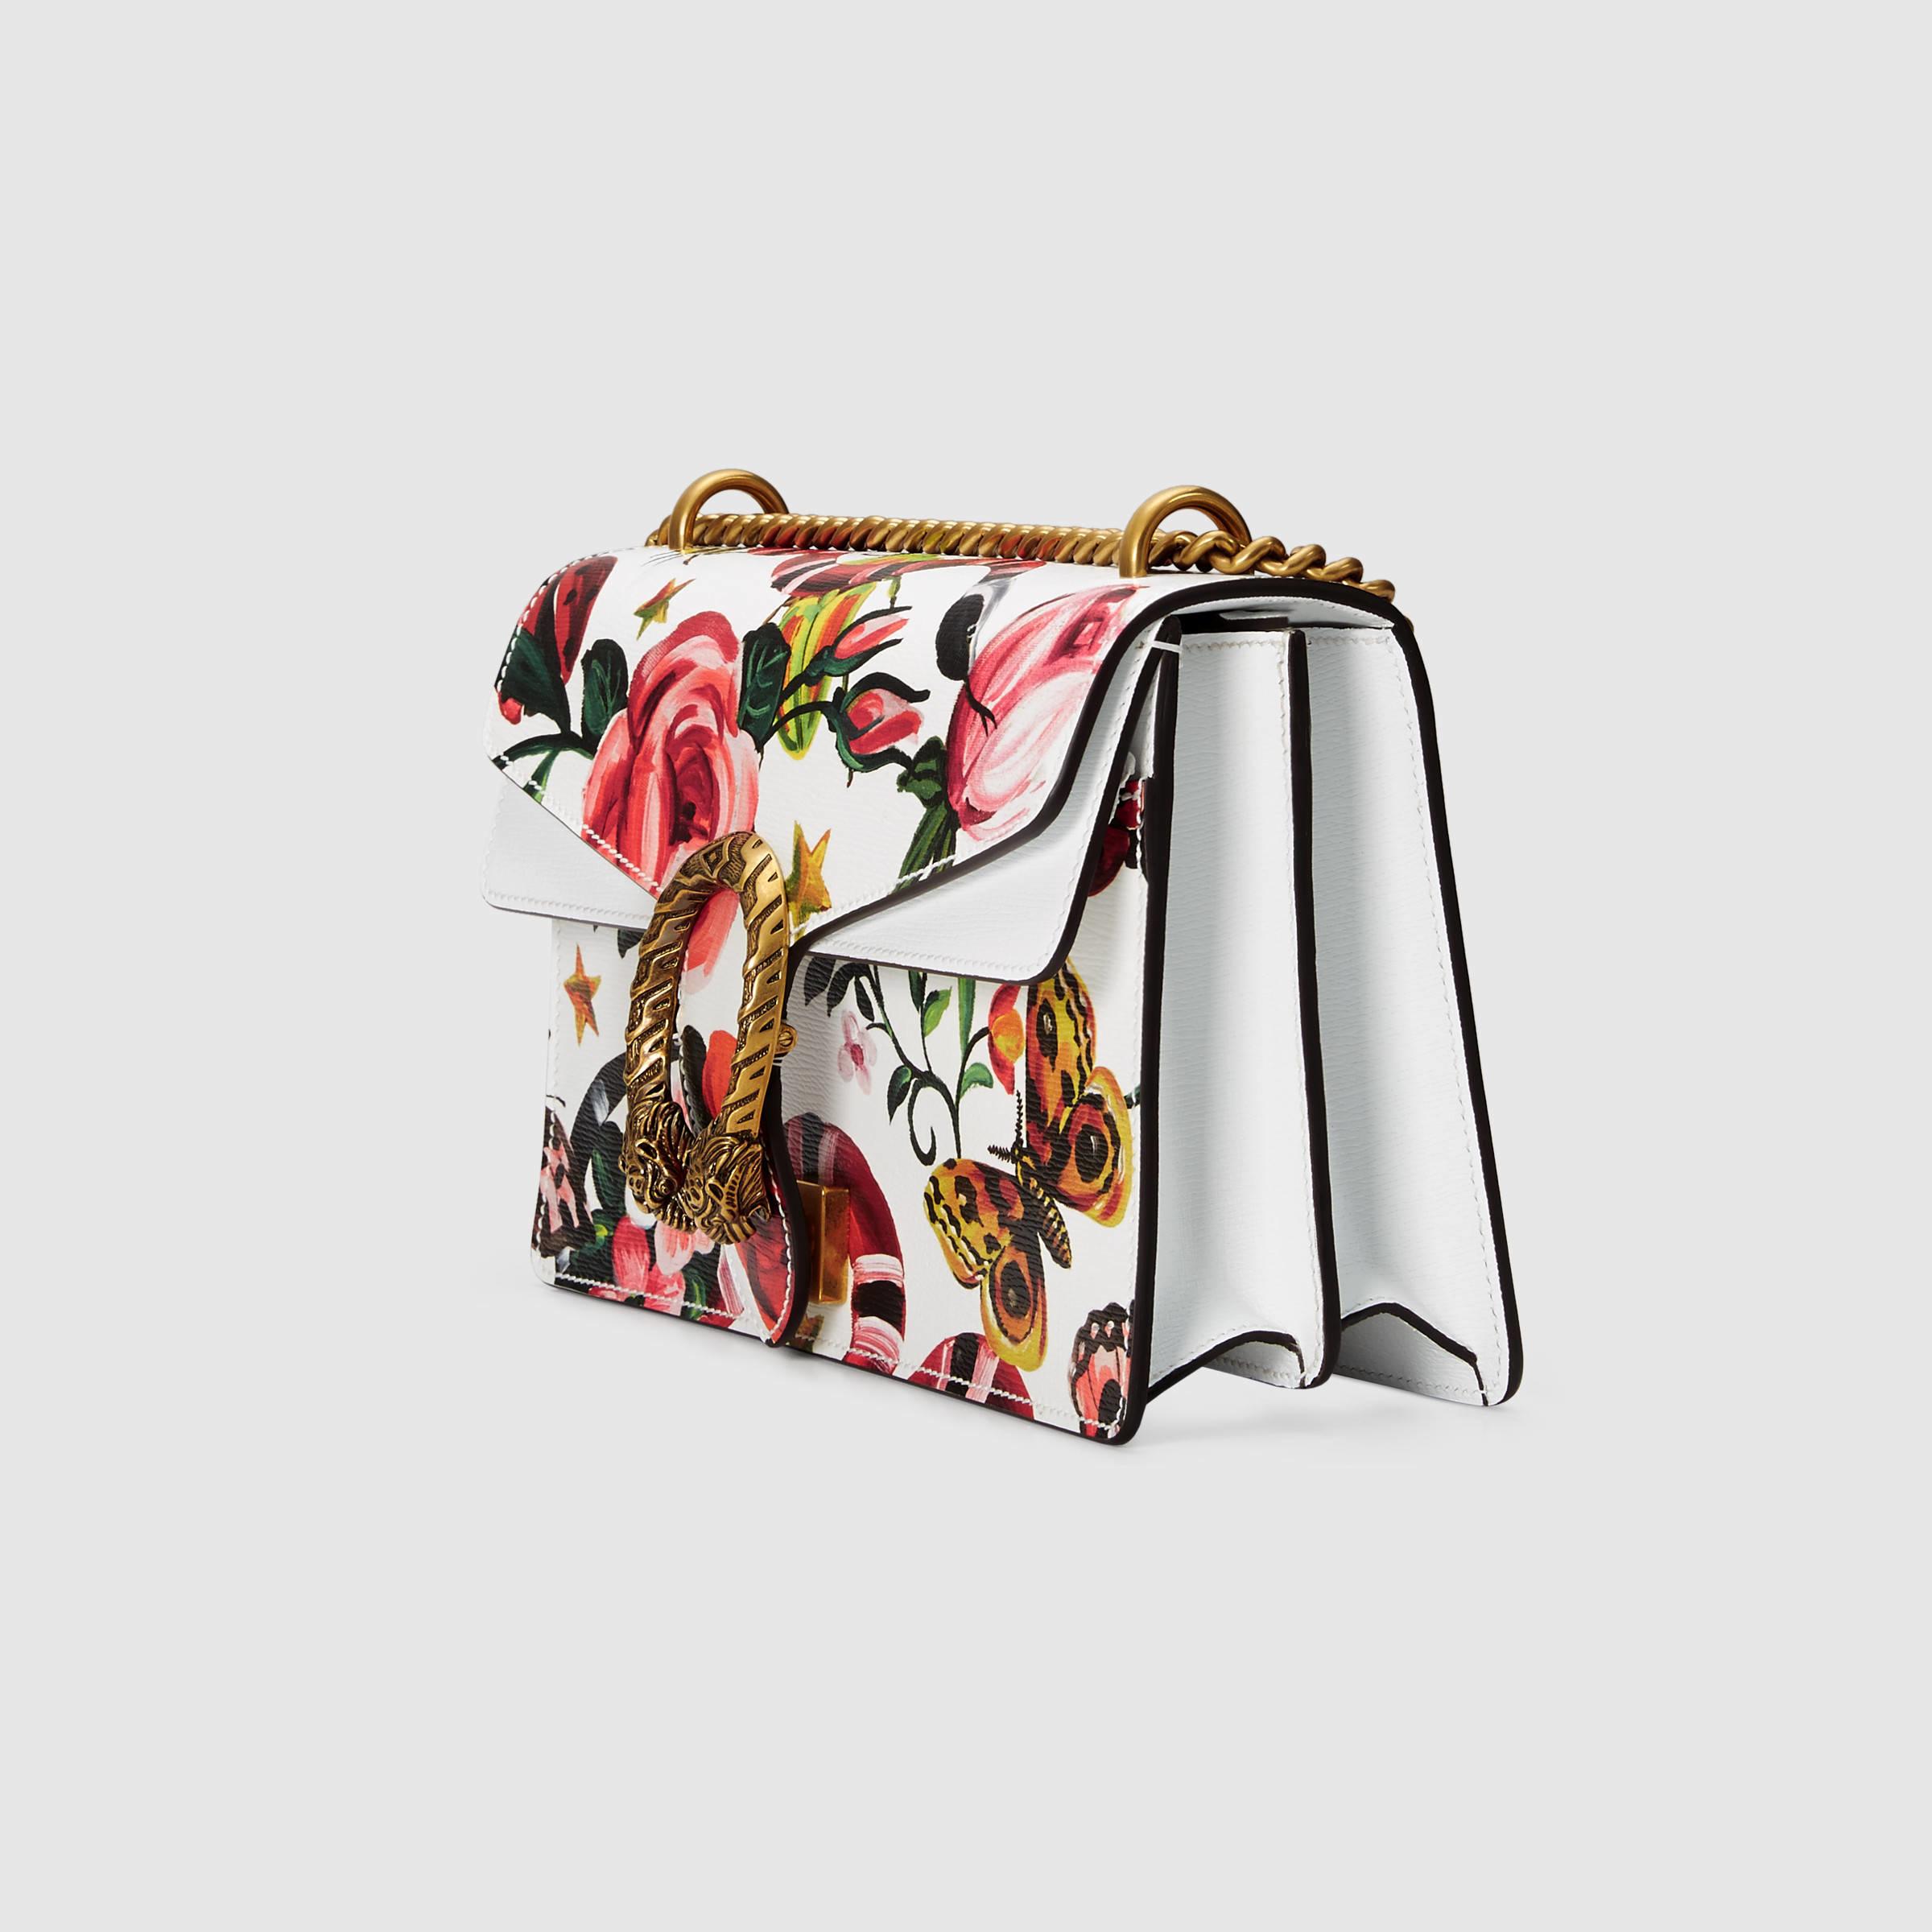 211e23ba0e7 Lyst - Gucci Garden Exclusive Dionysus Shoulder Bag